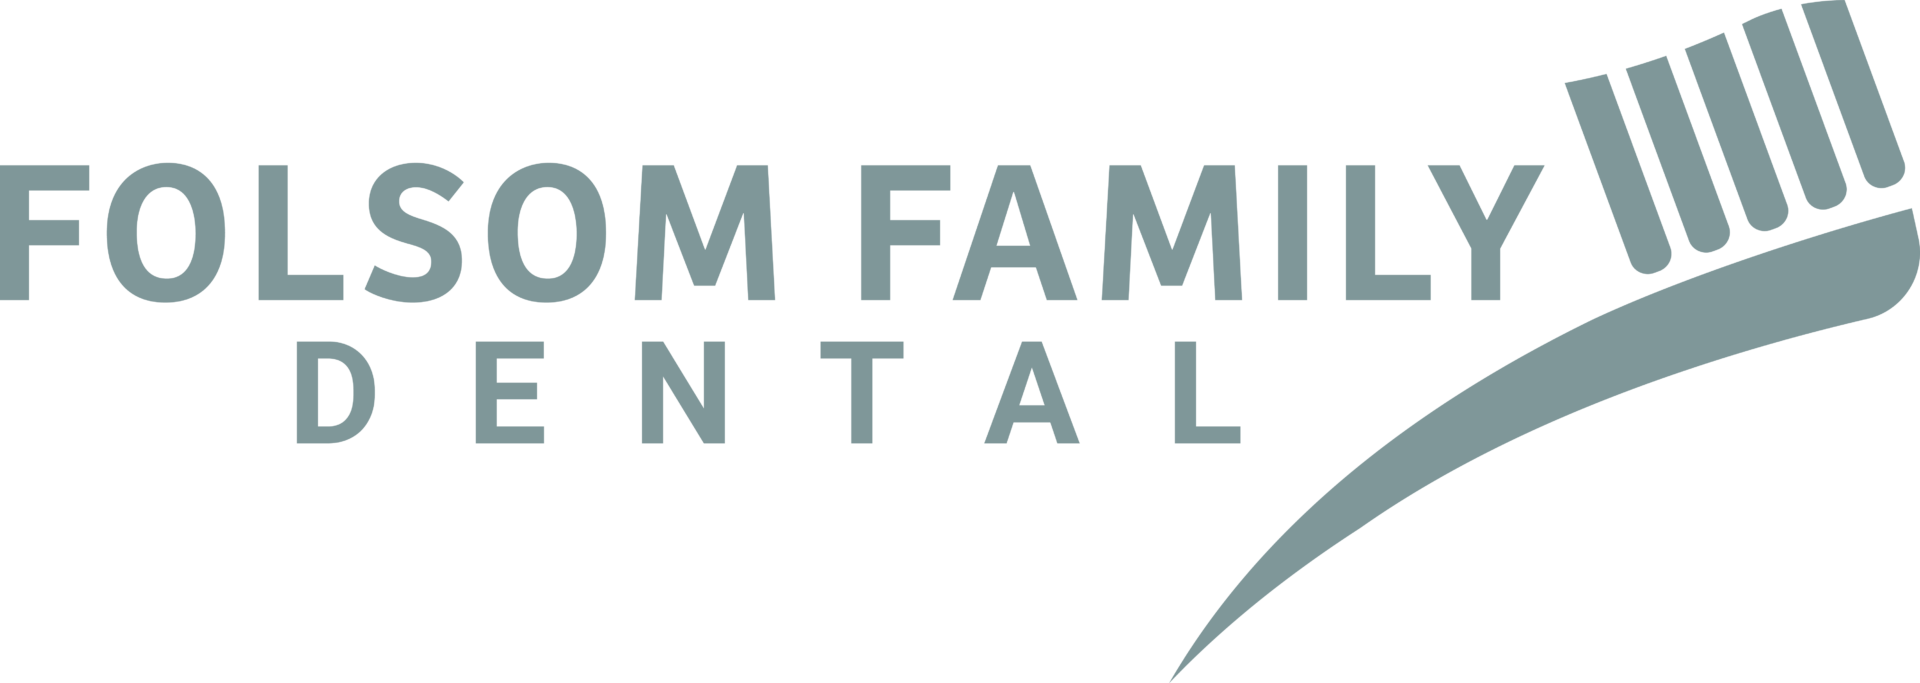 CX-12954_Folsom Family Dental